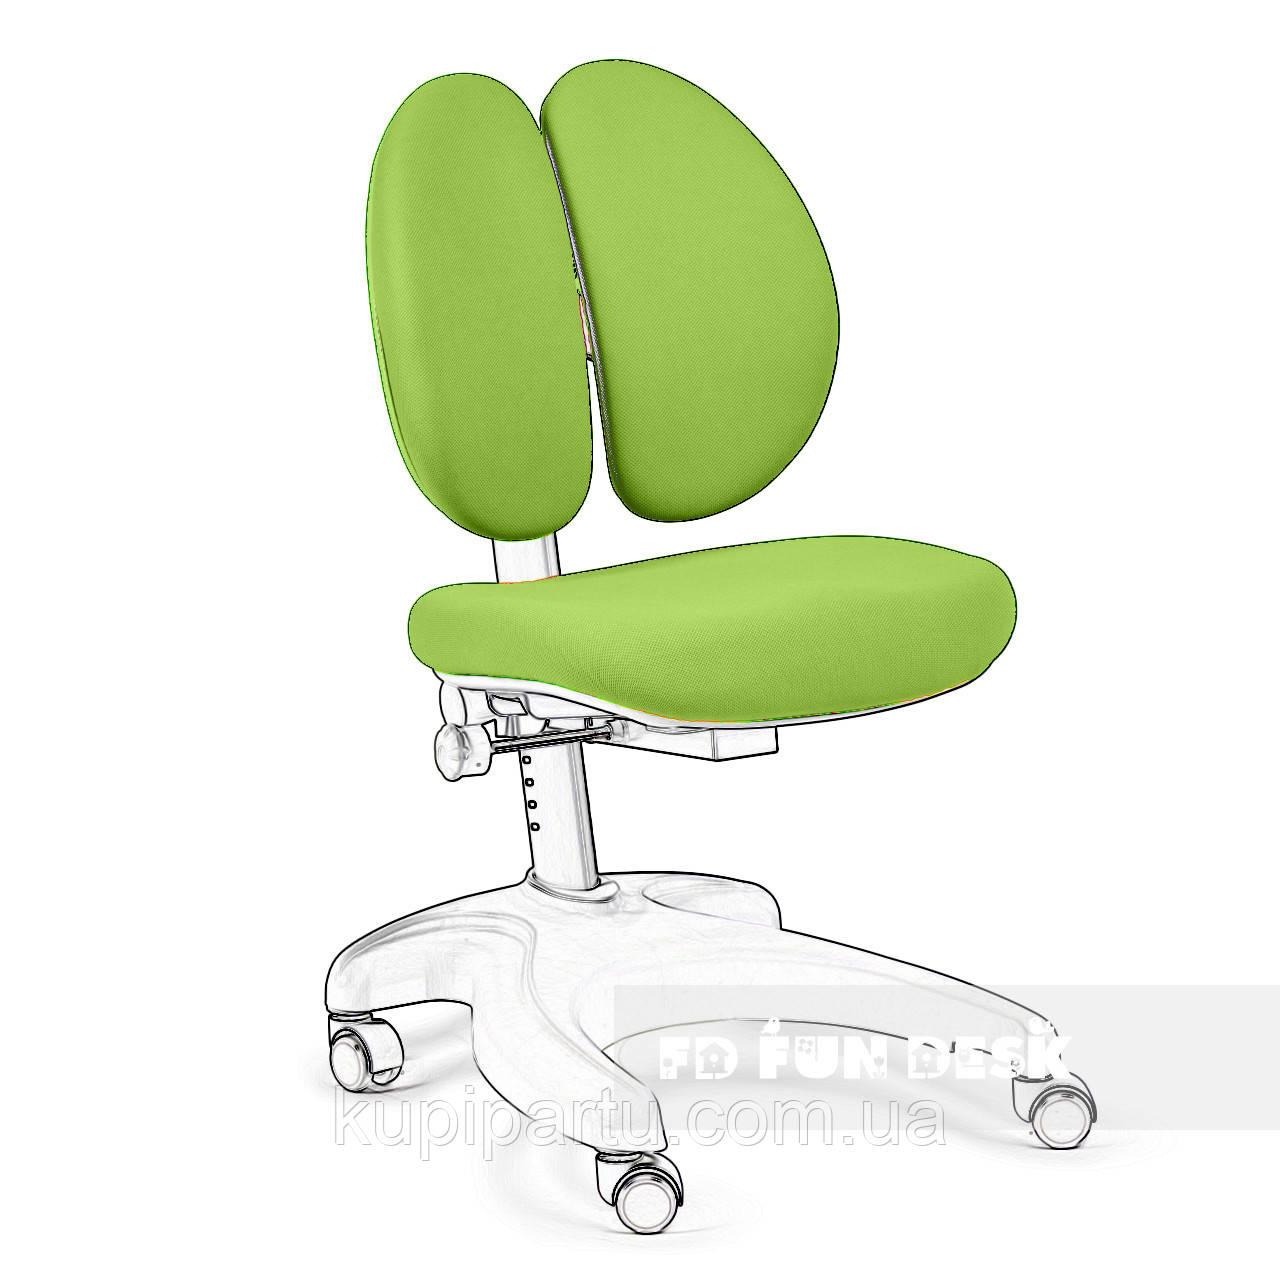 Чехол для кресла Solerte Green